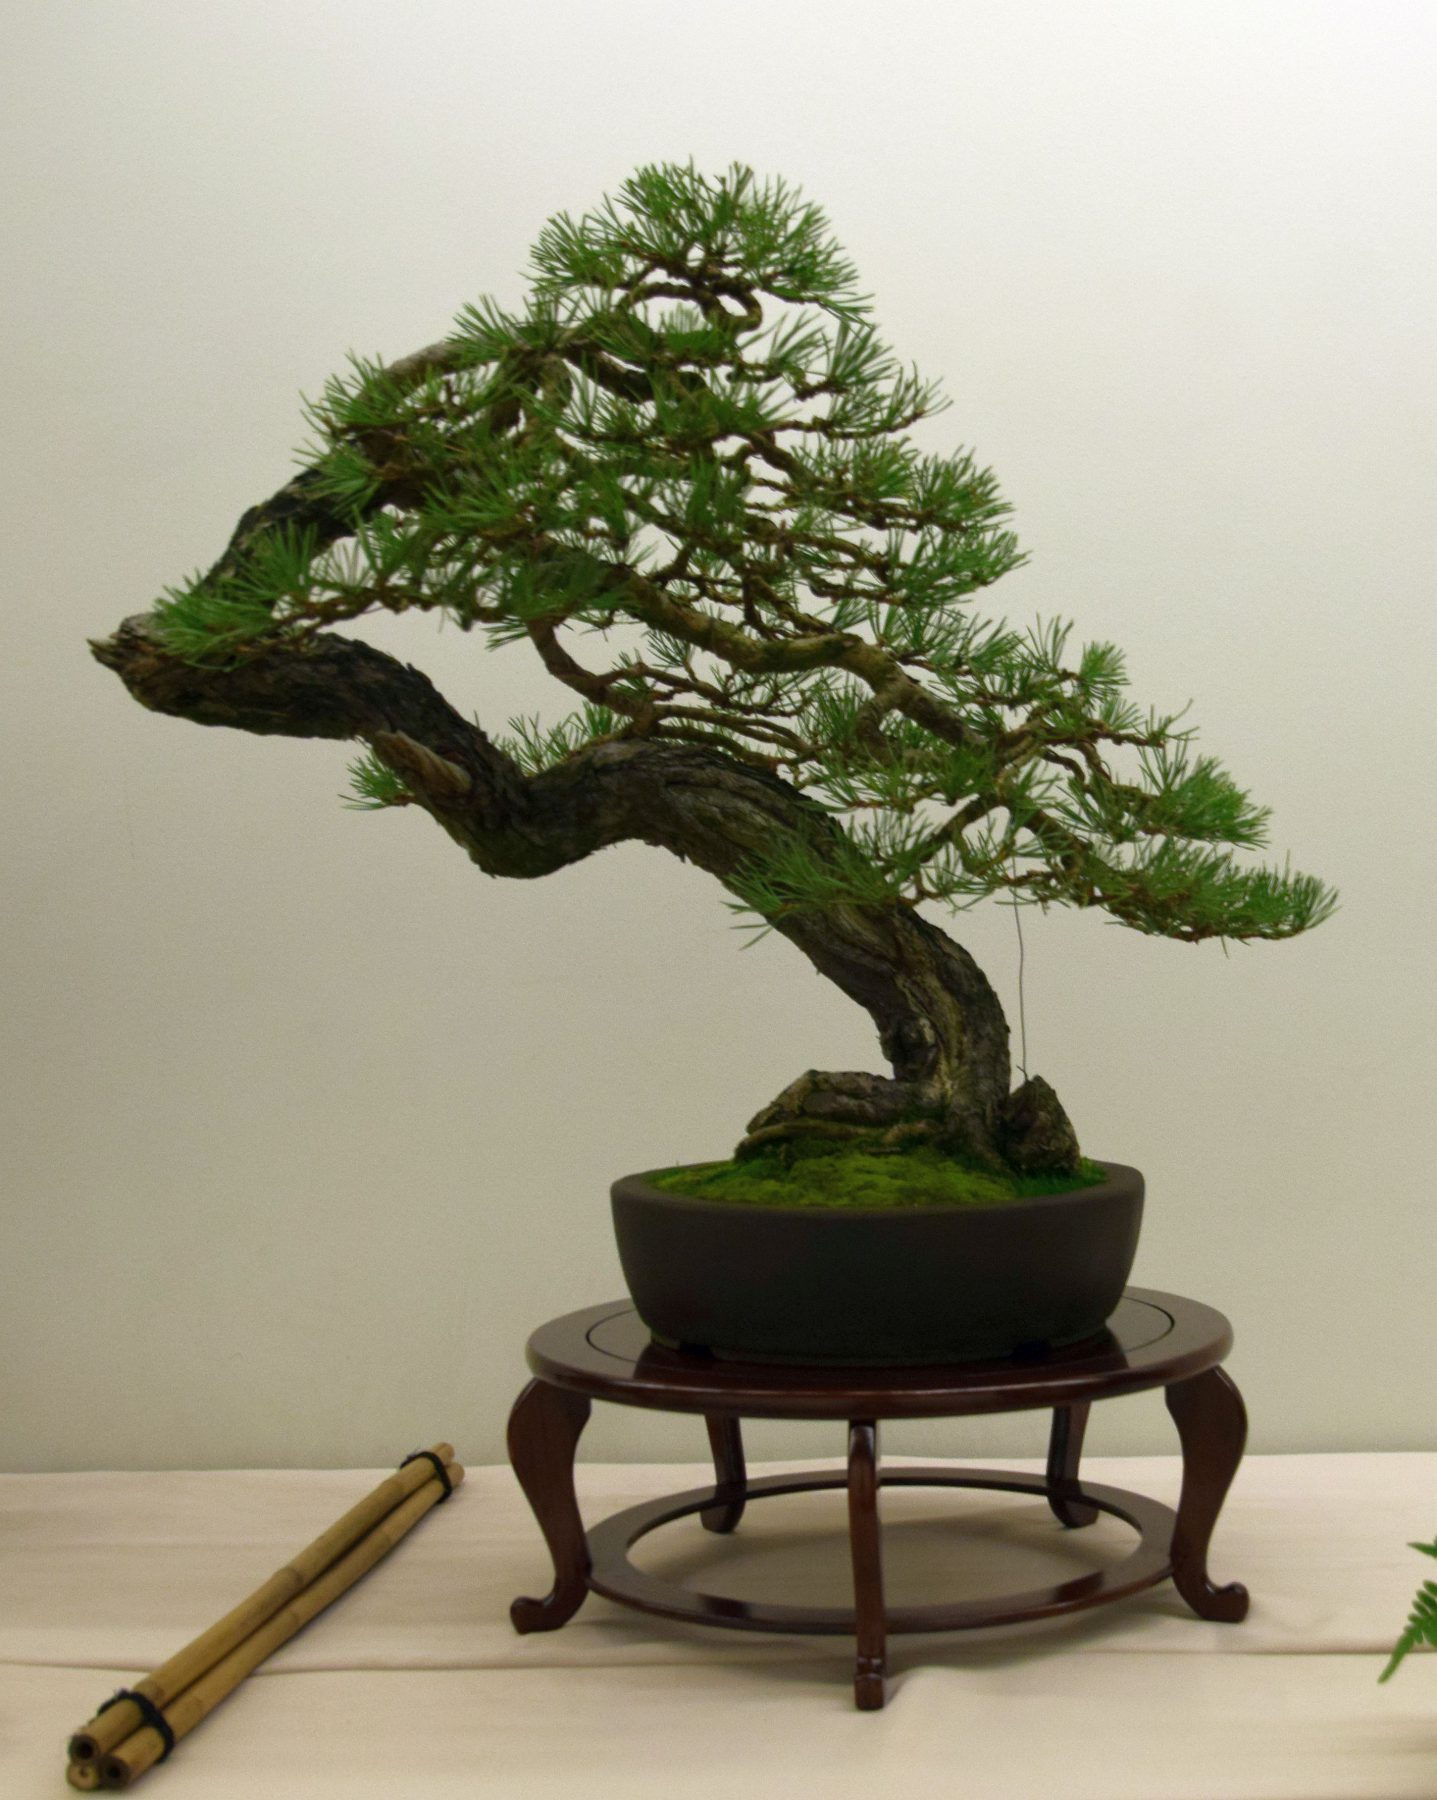 euk-bonsai-ten-2016-club-bonsai-003